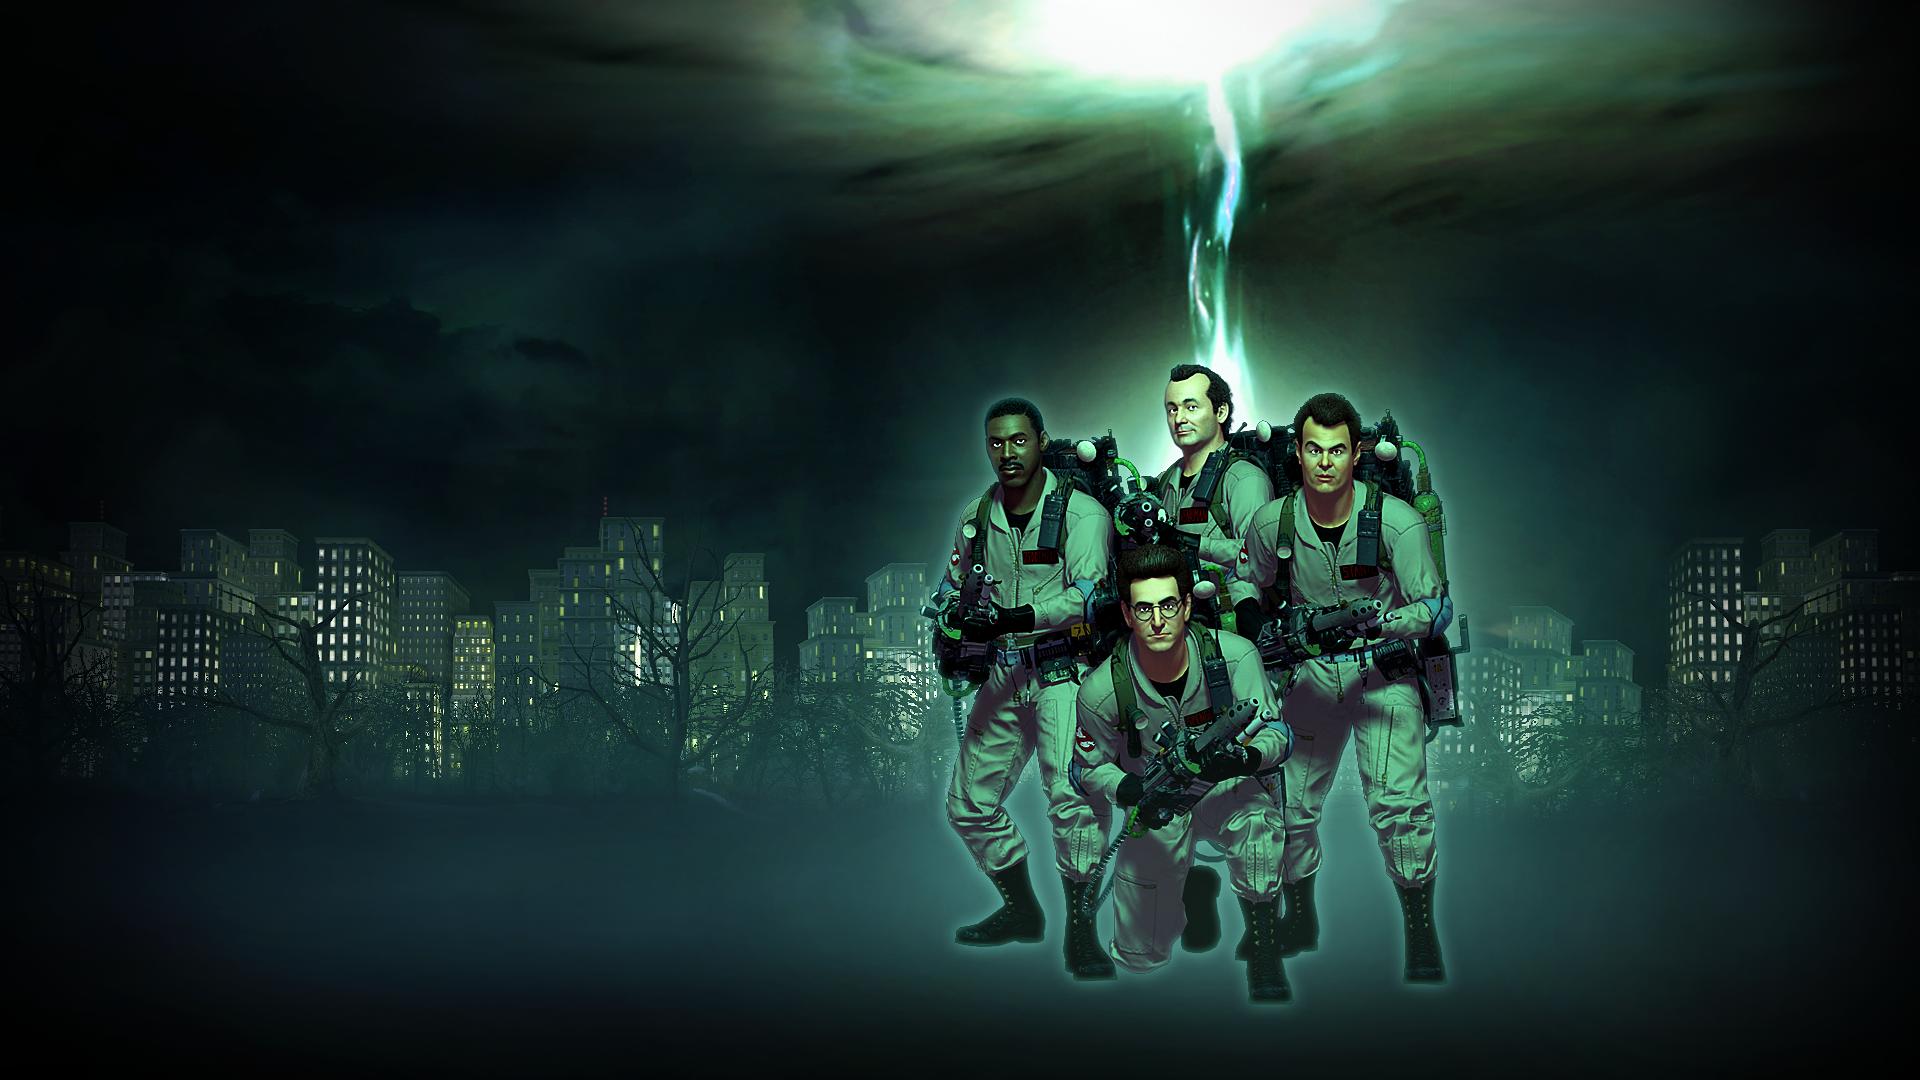 Ghostbusters 3d Picture Hd Desktop Background Wallpapers Hd Free 603704 Die Geisterjager